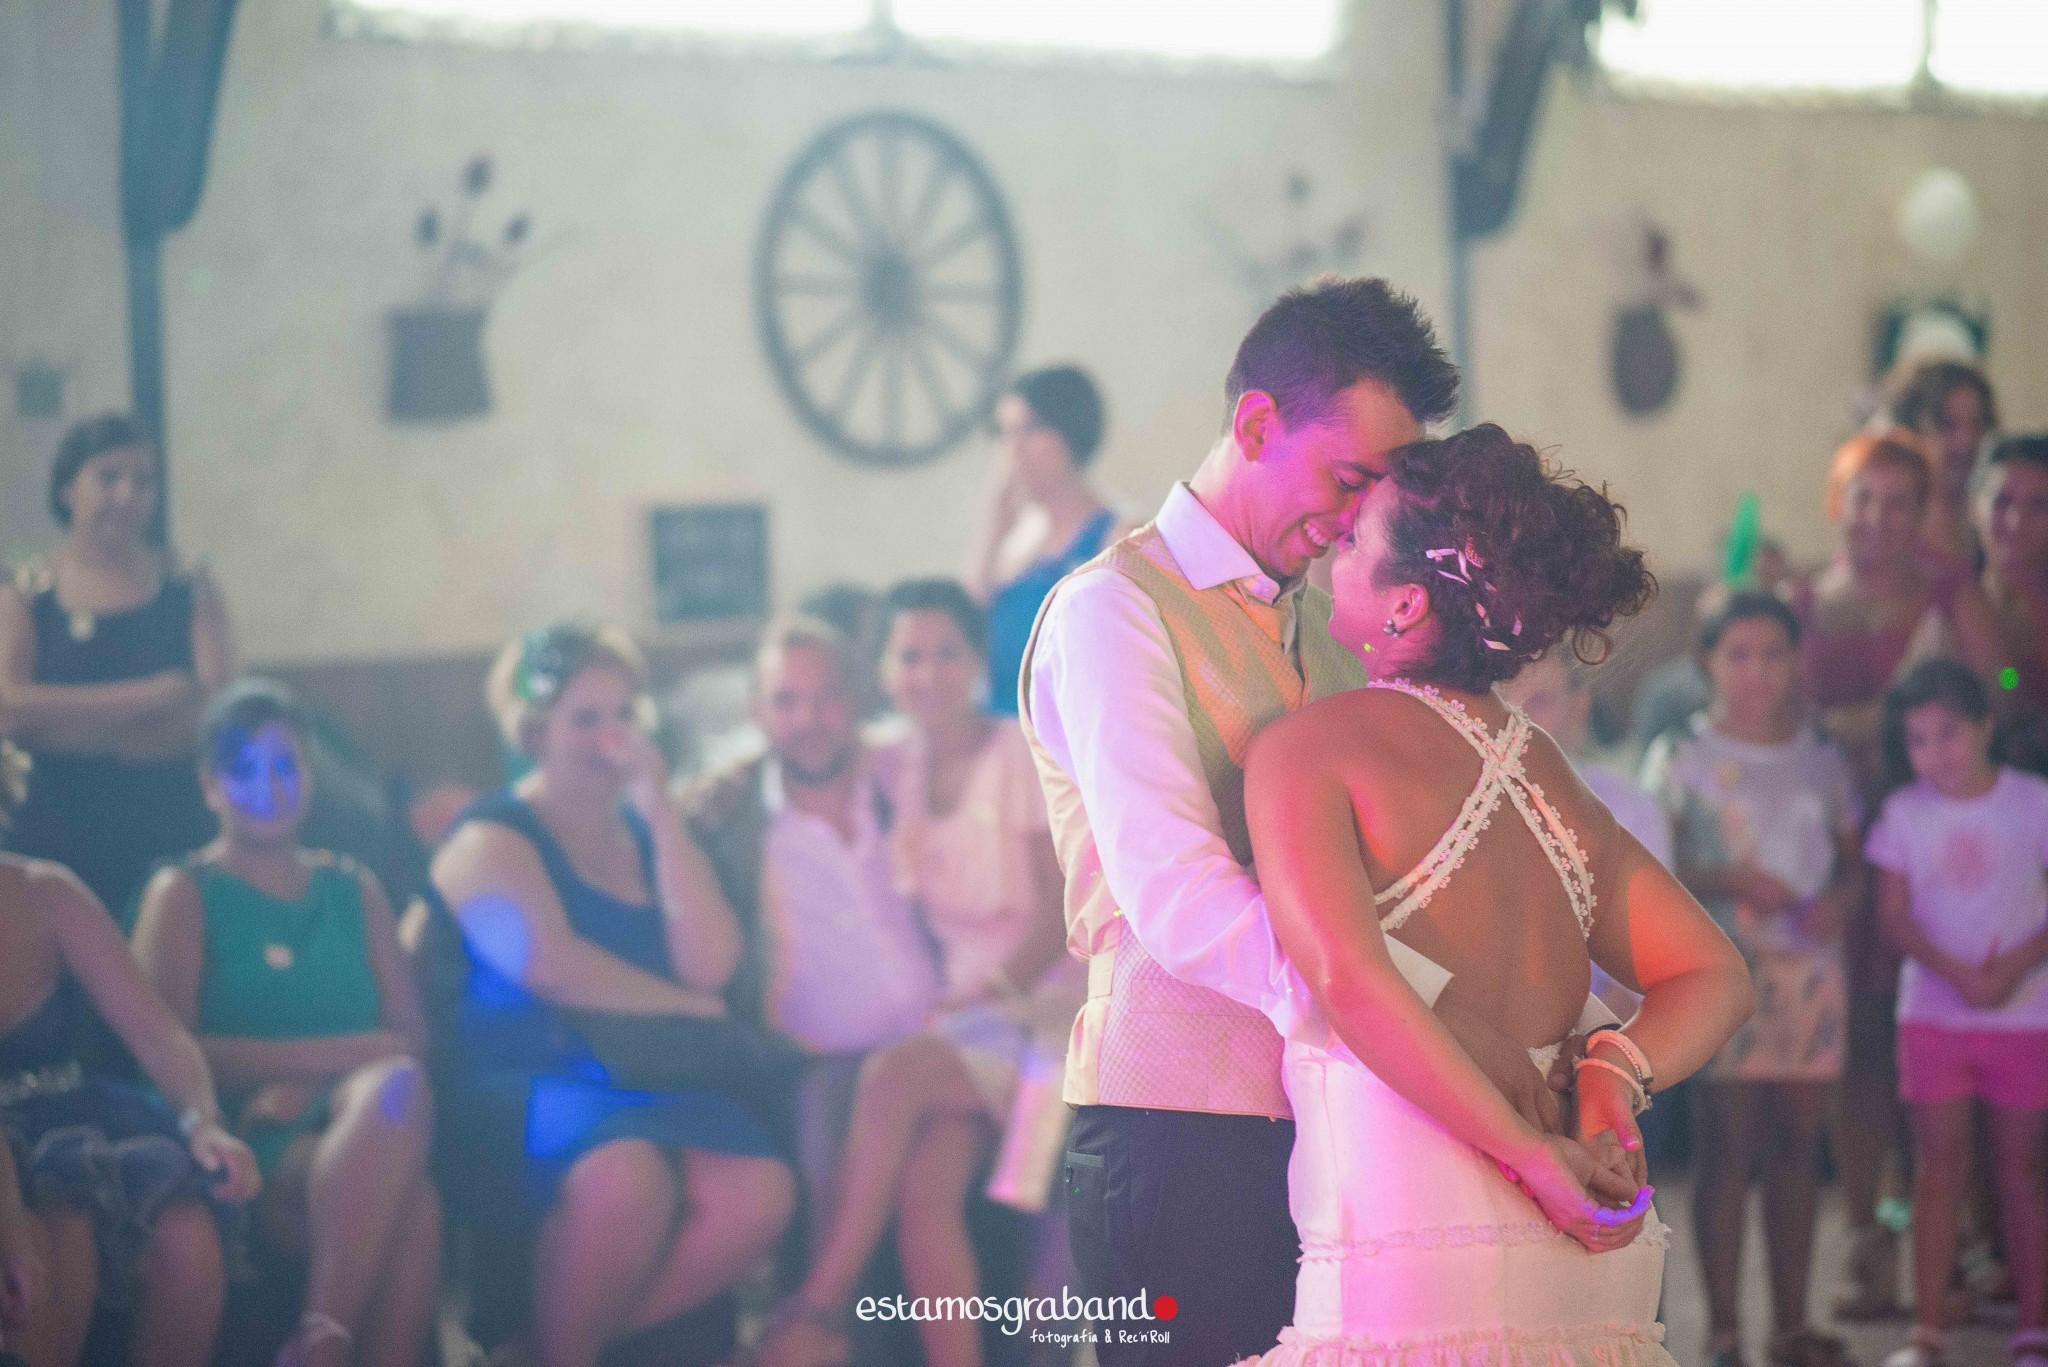 pili-y-jose_fotograficc81a-cadiz-99 Pili & Jose - video boda cadiz